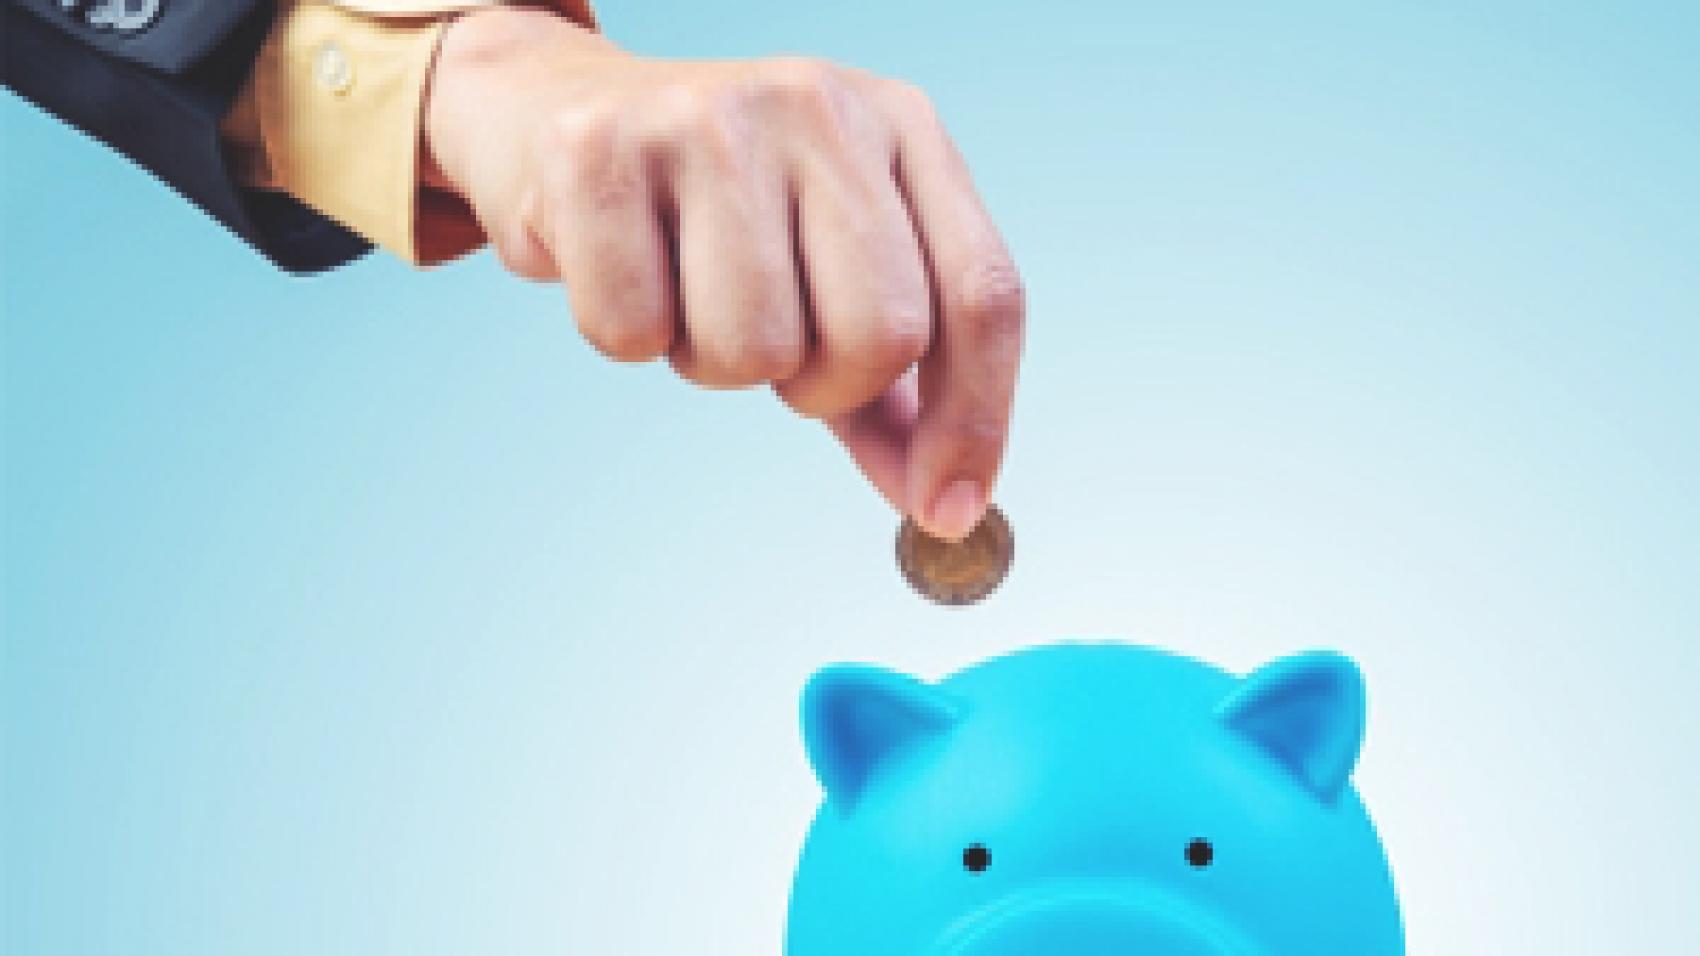 outsourcing perks: enough savings